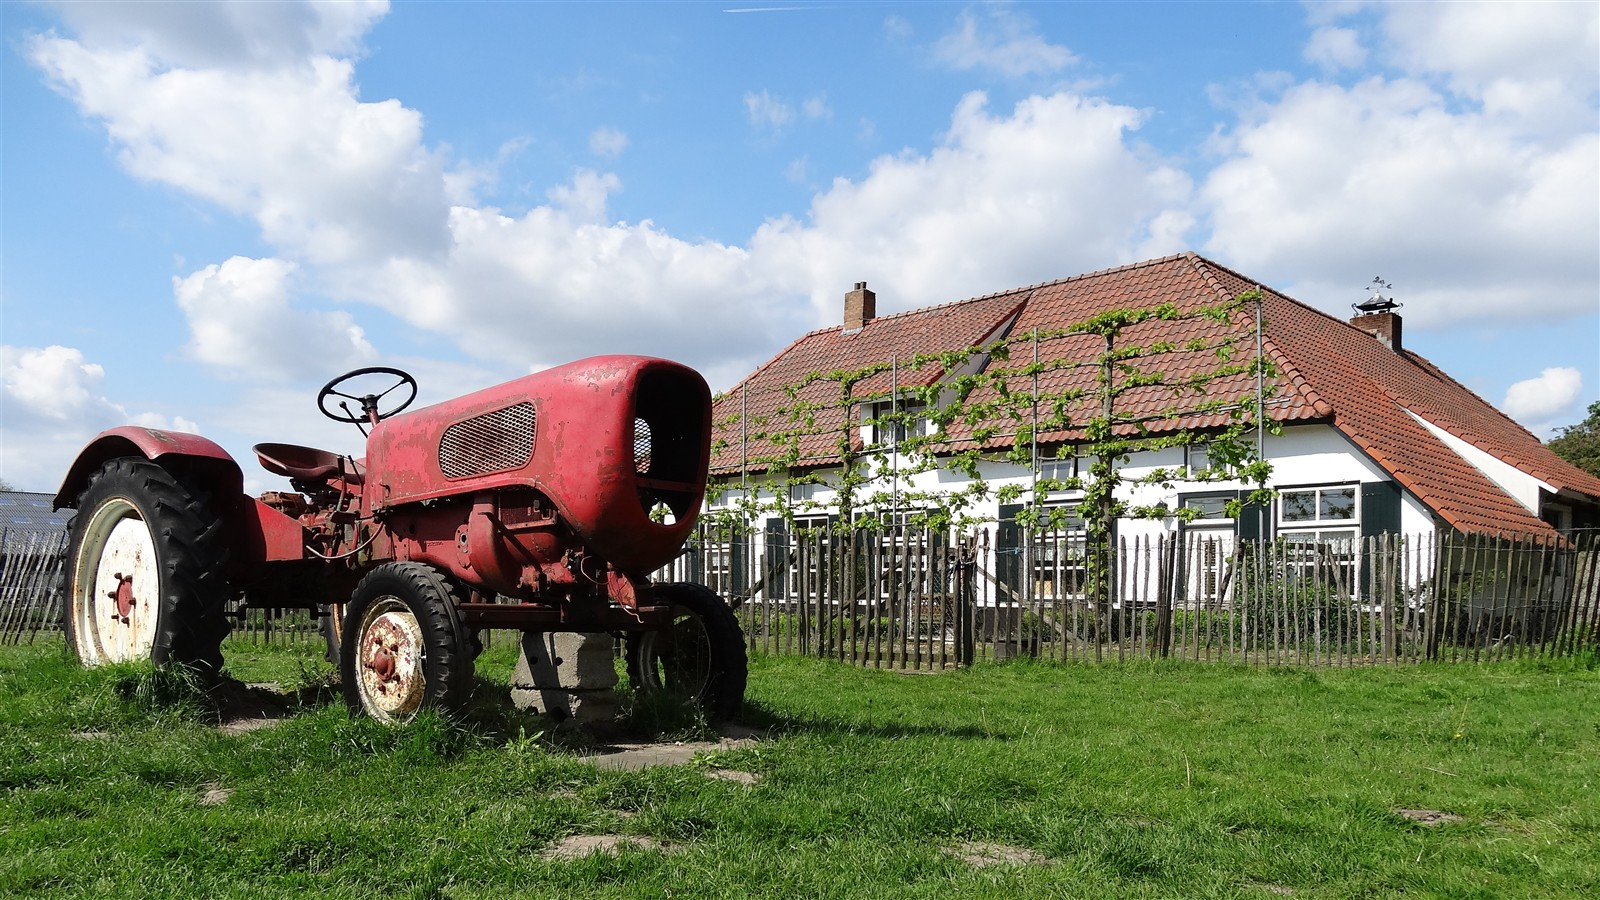 Sony hx20v dutch farm dutchpepper galleries digital for Farm house netherlands